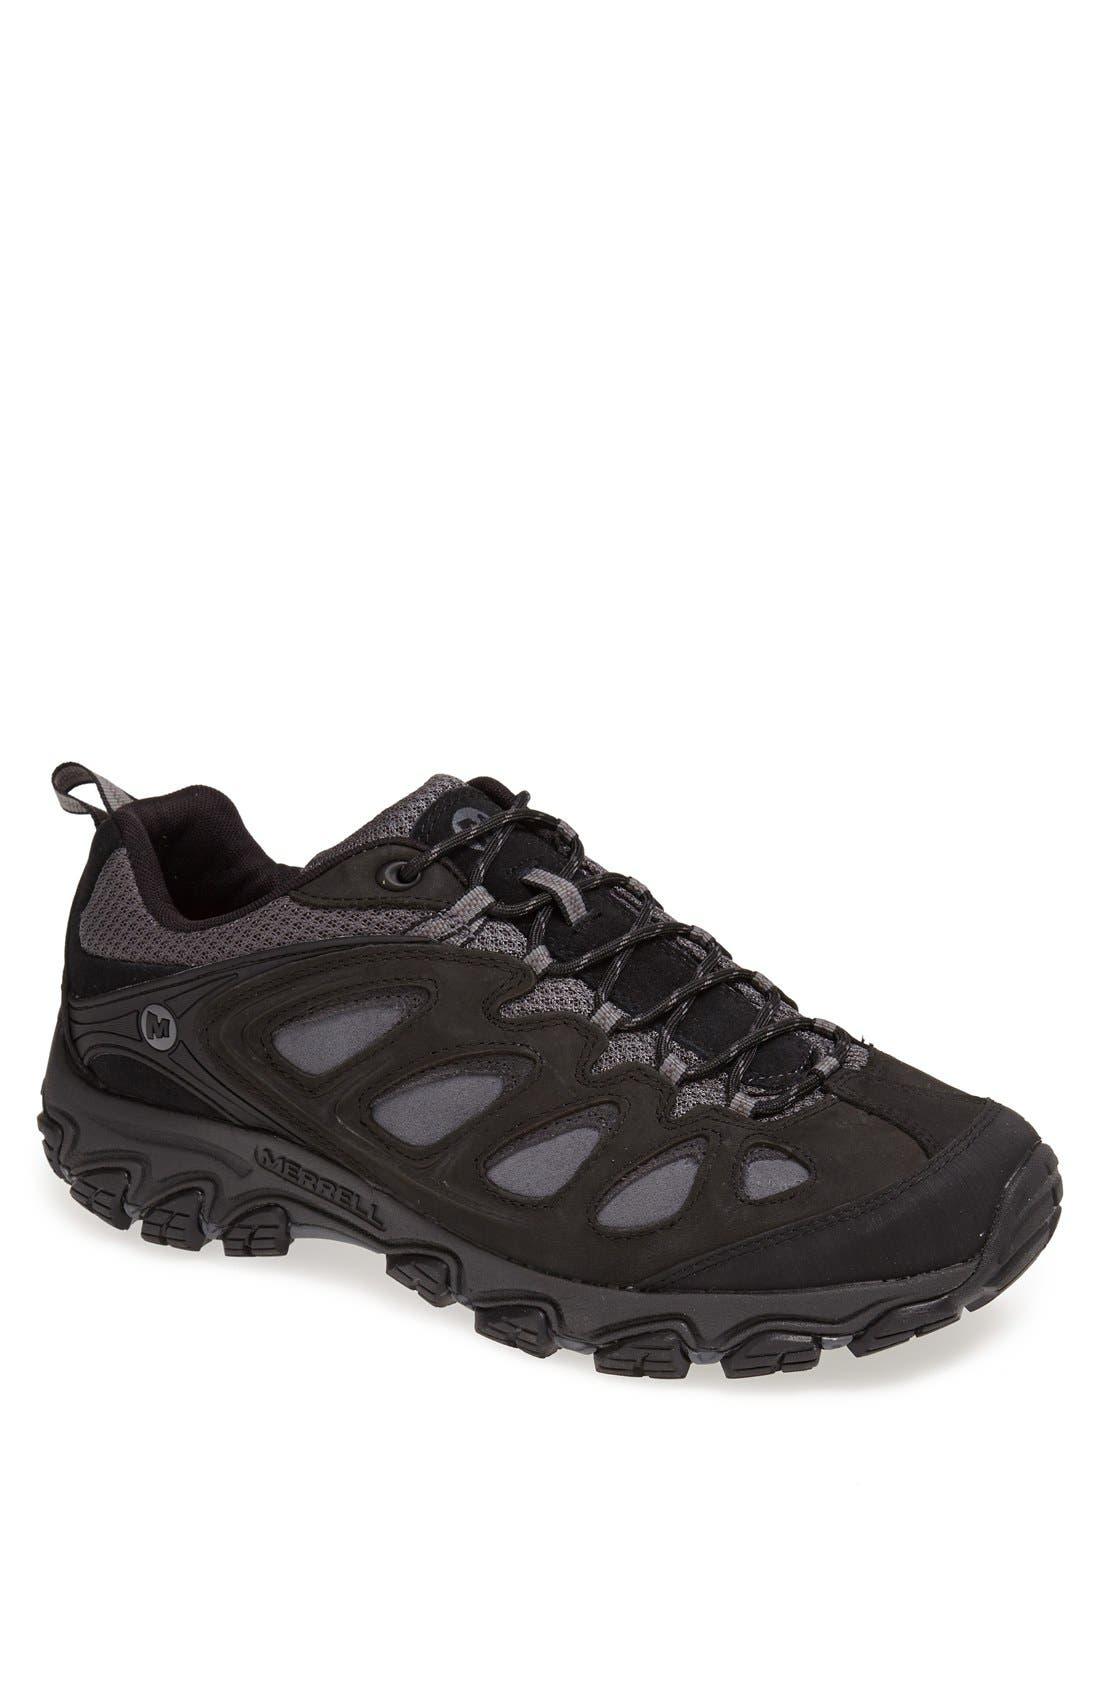 Alternate Image 1 Selected - Merrell 'Pulsate' Hiking Shoe (Men)